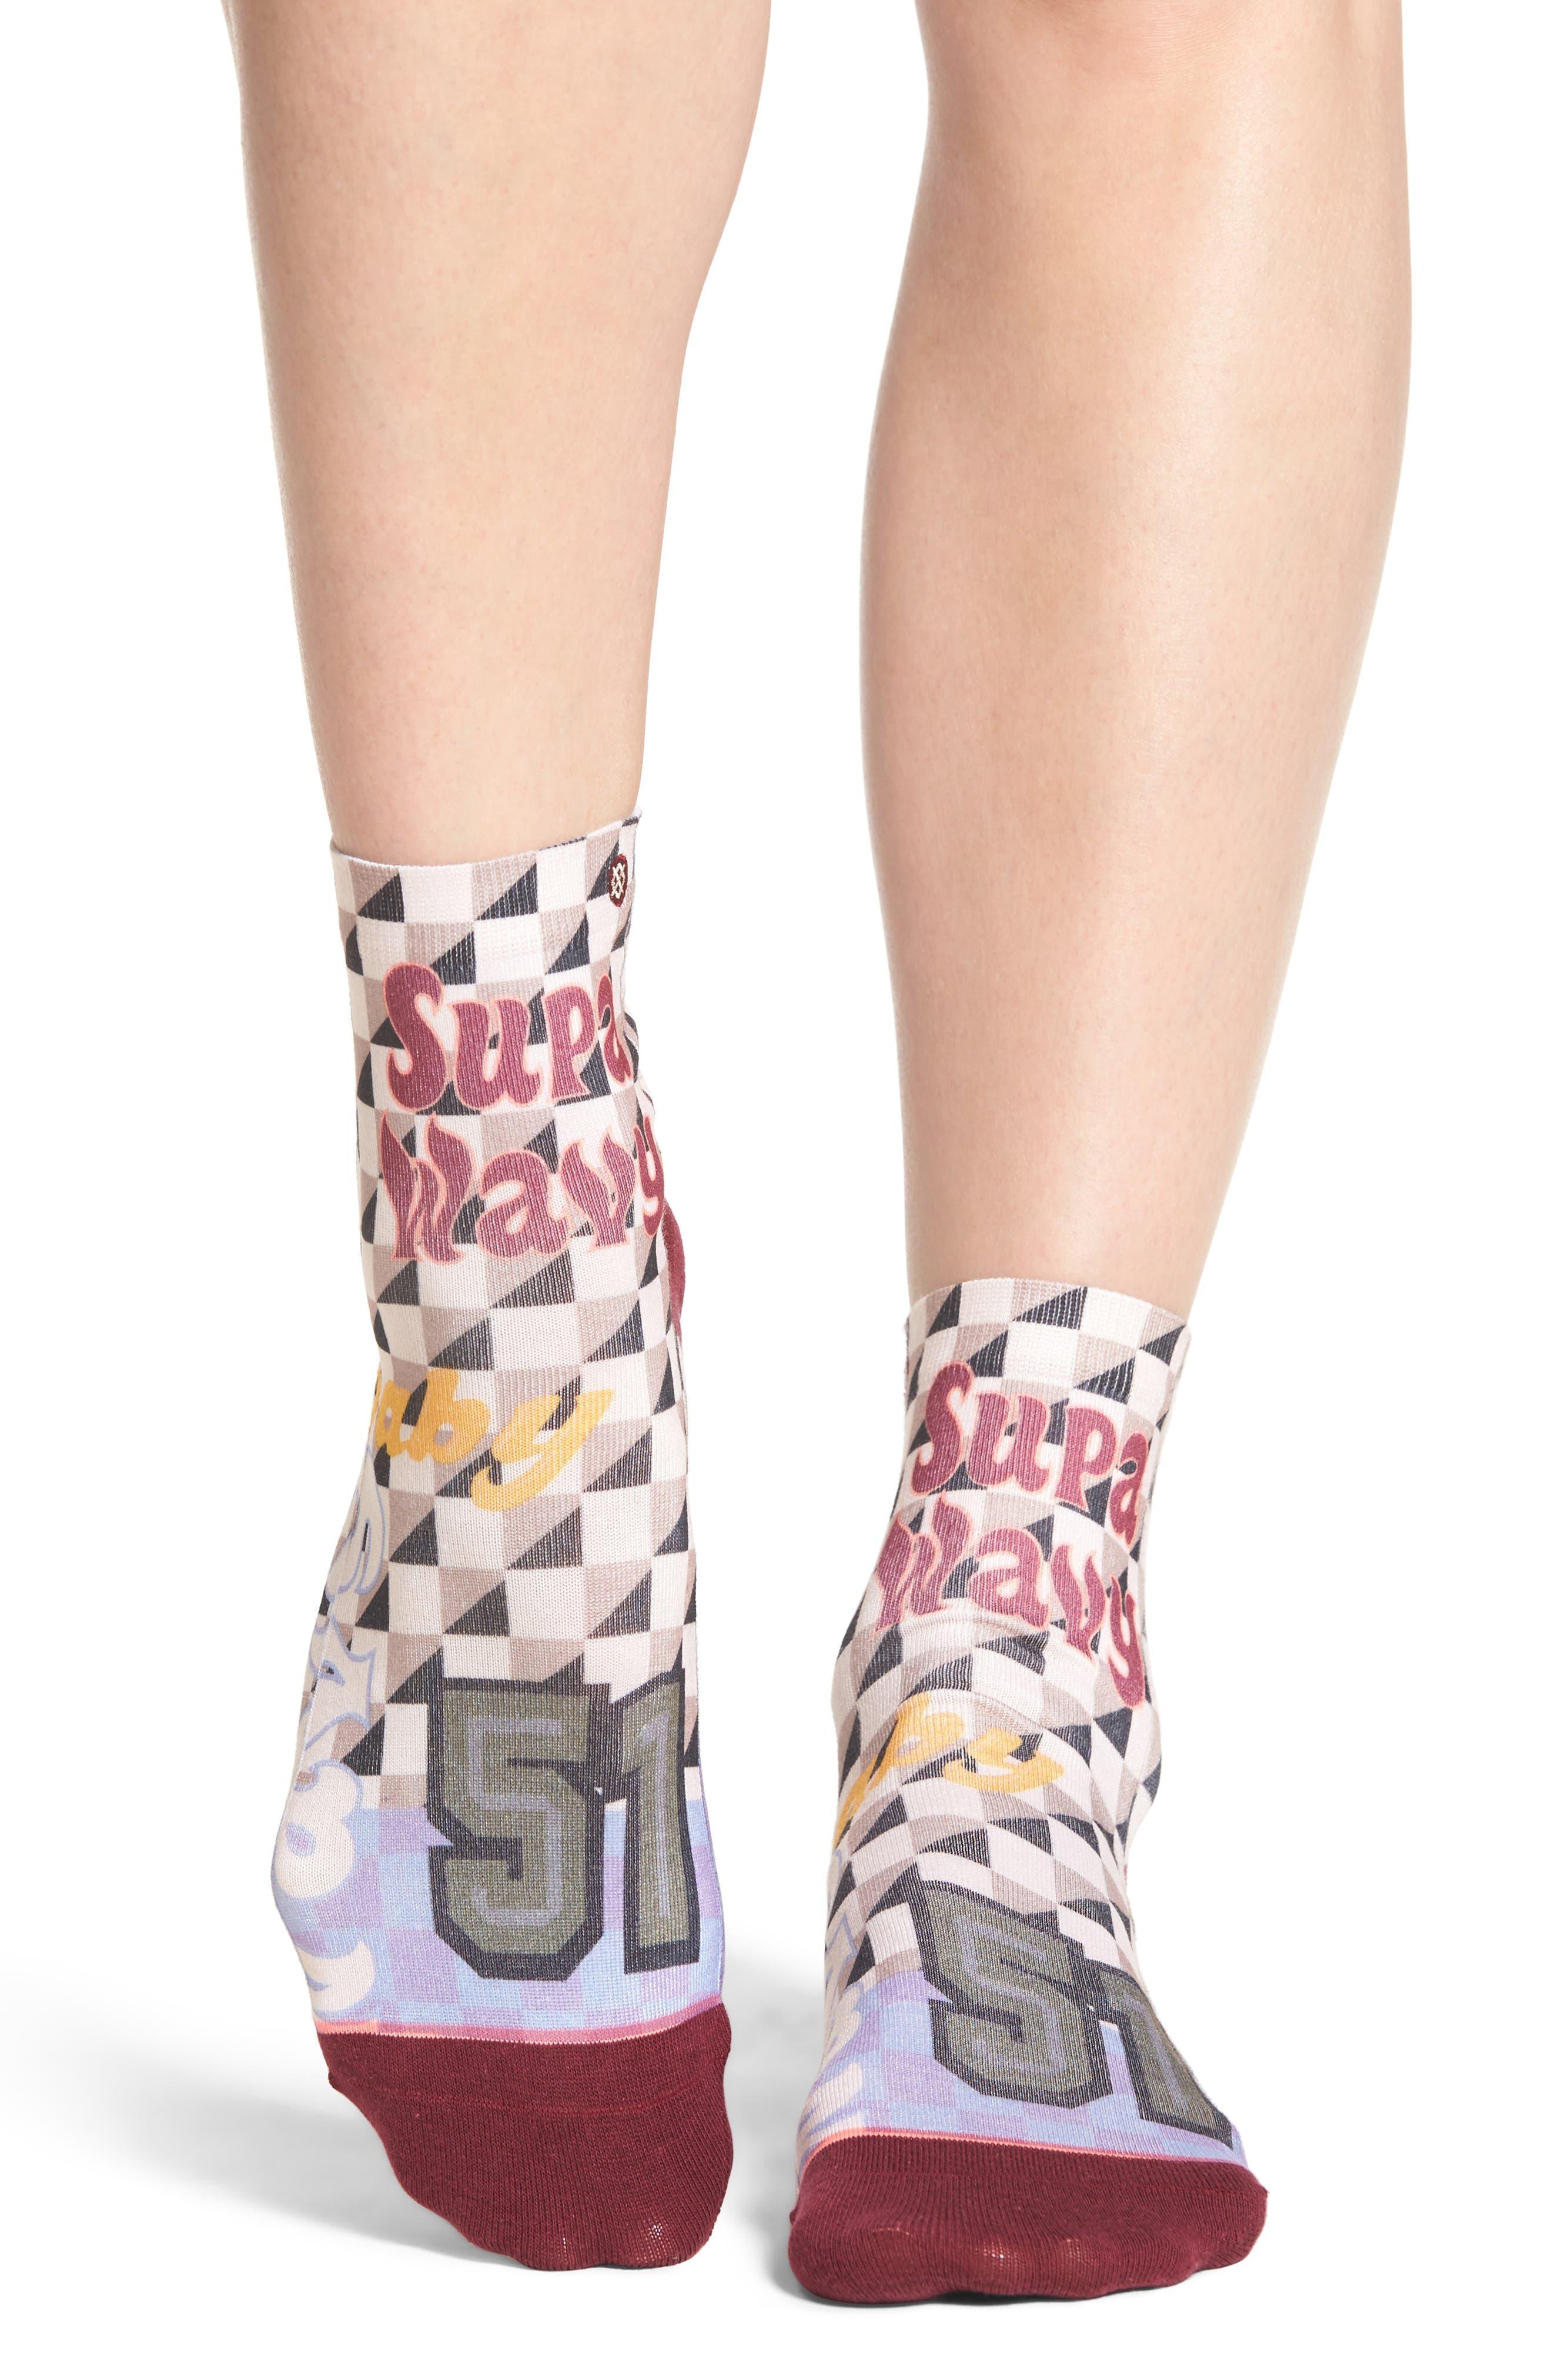 Main Image - Stance Lowrider Supa Wavy Socks